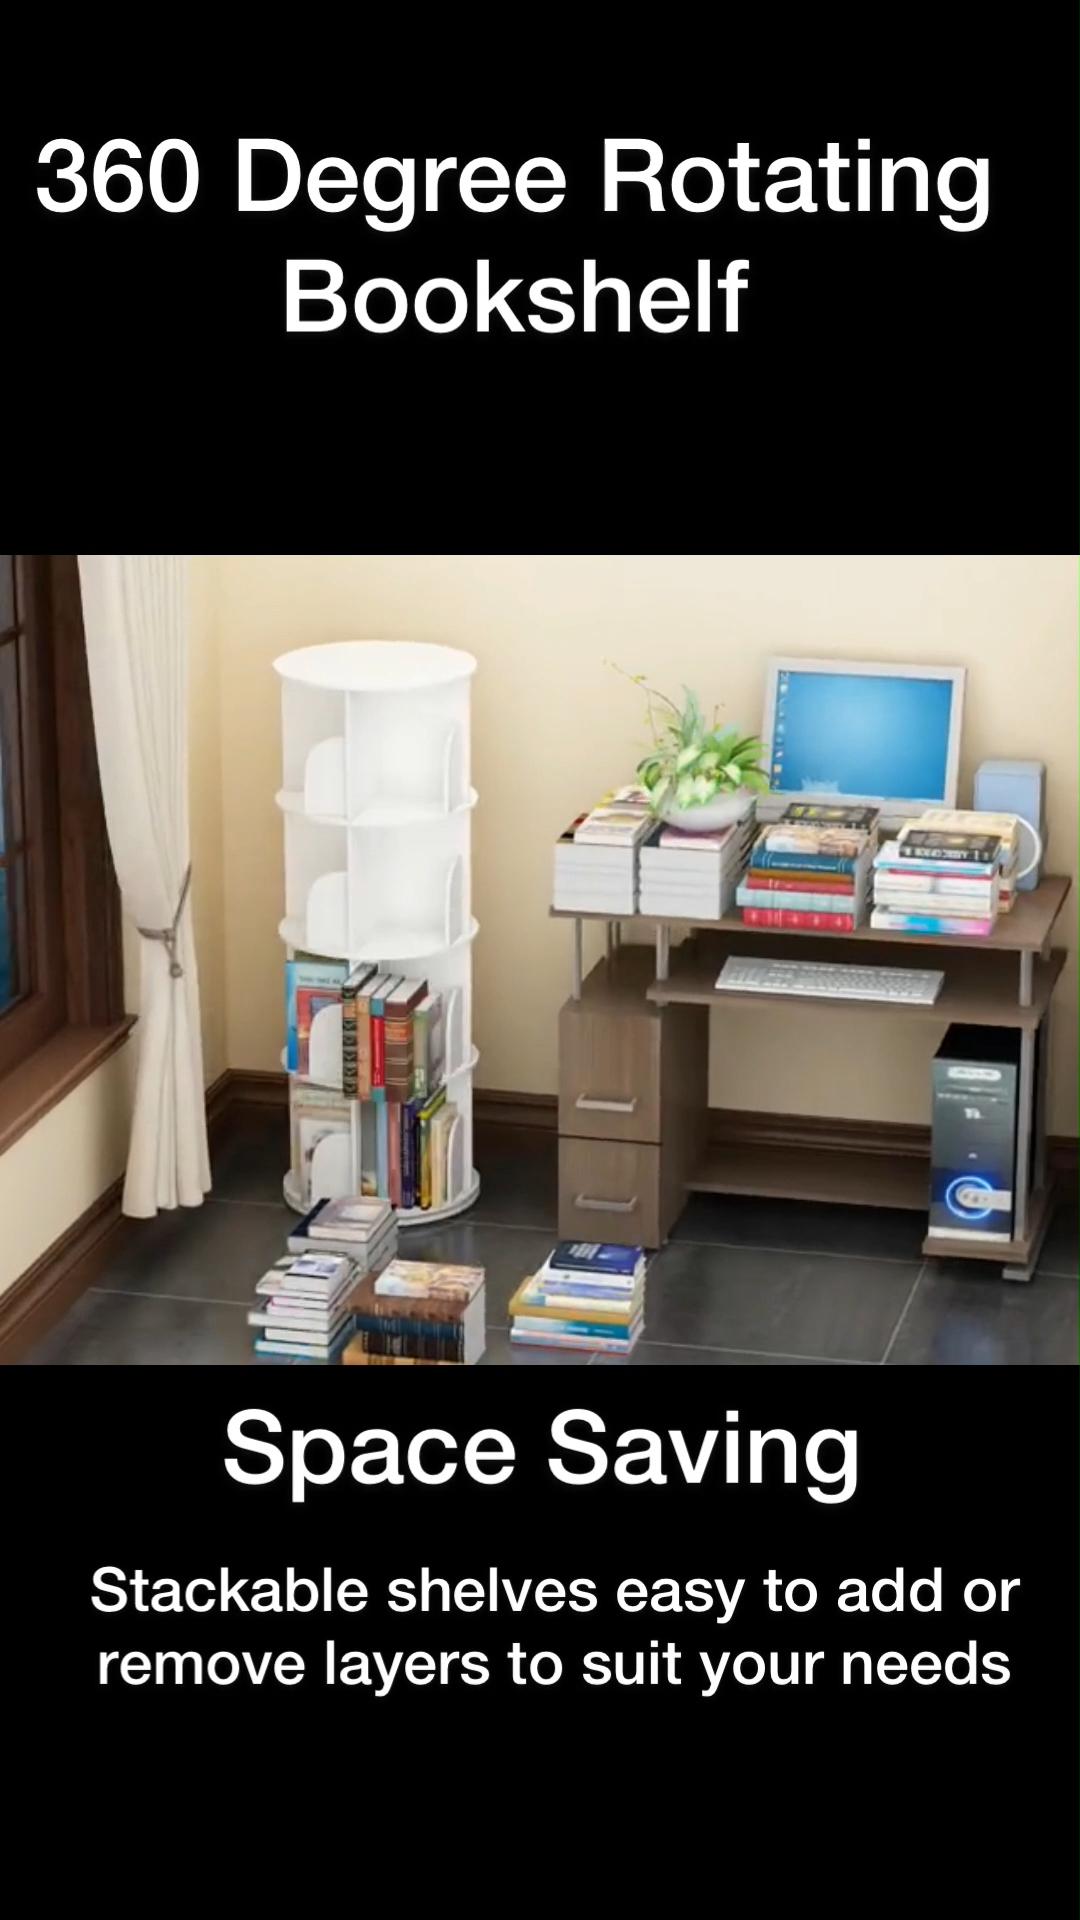 360° Rotating Stackable Shelves Bookshelf Organizer